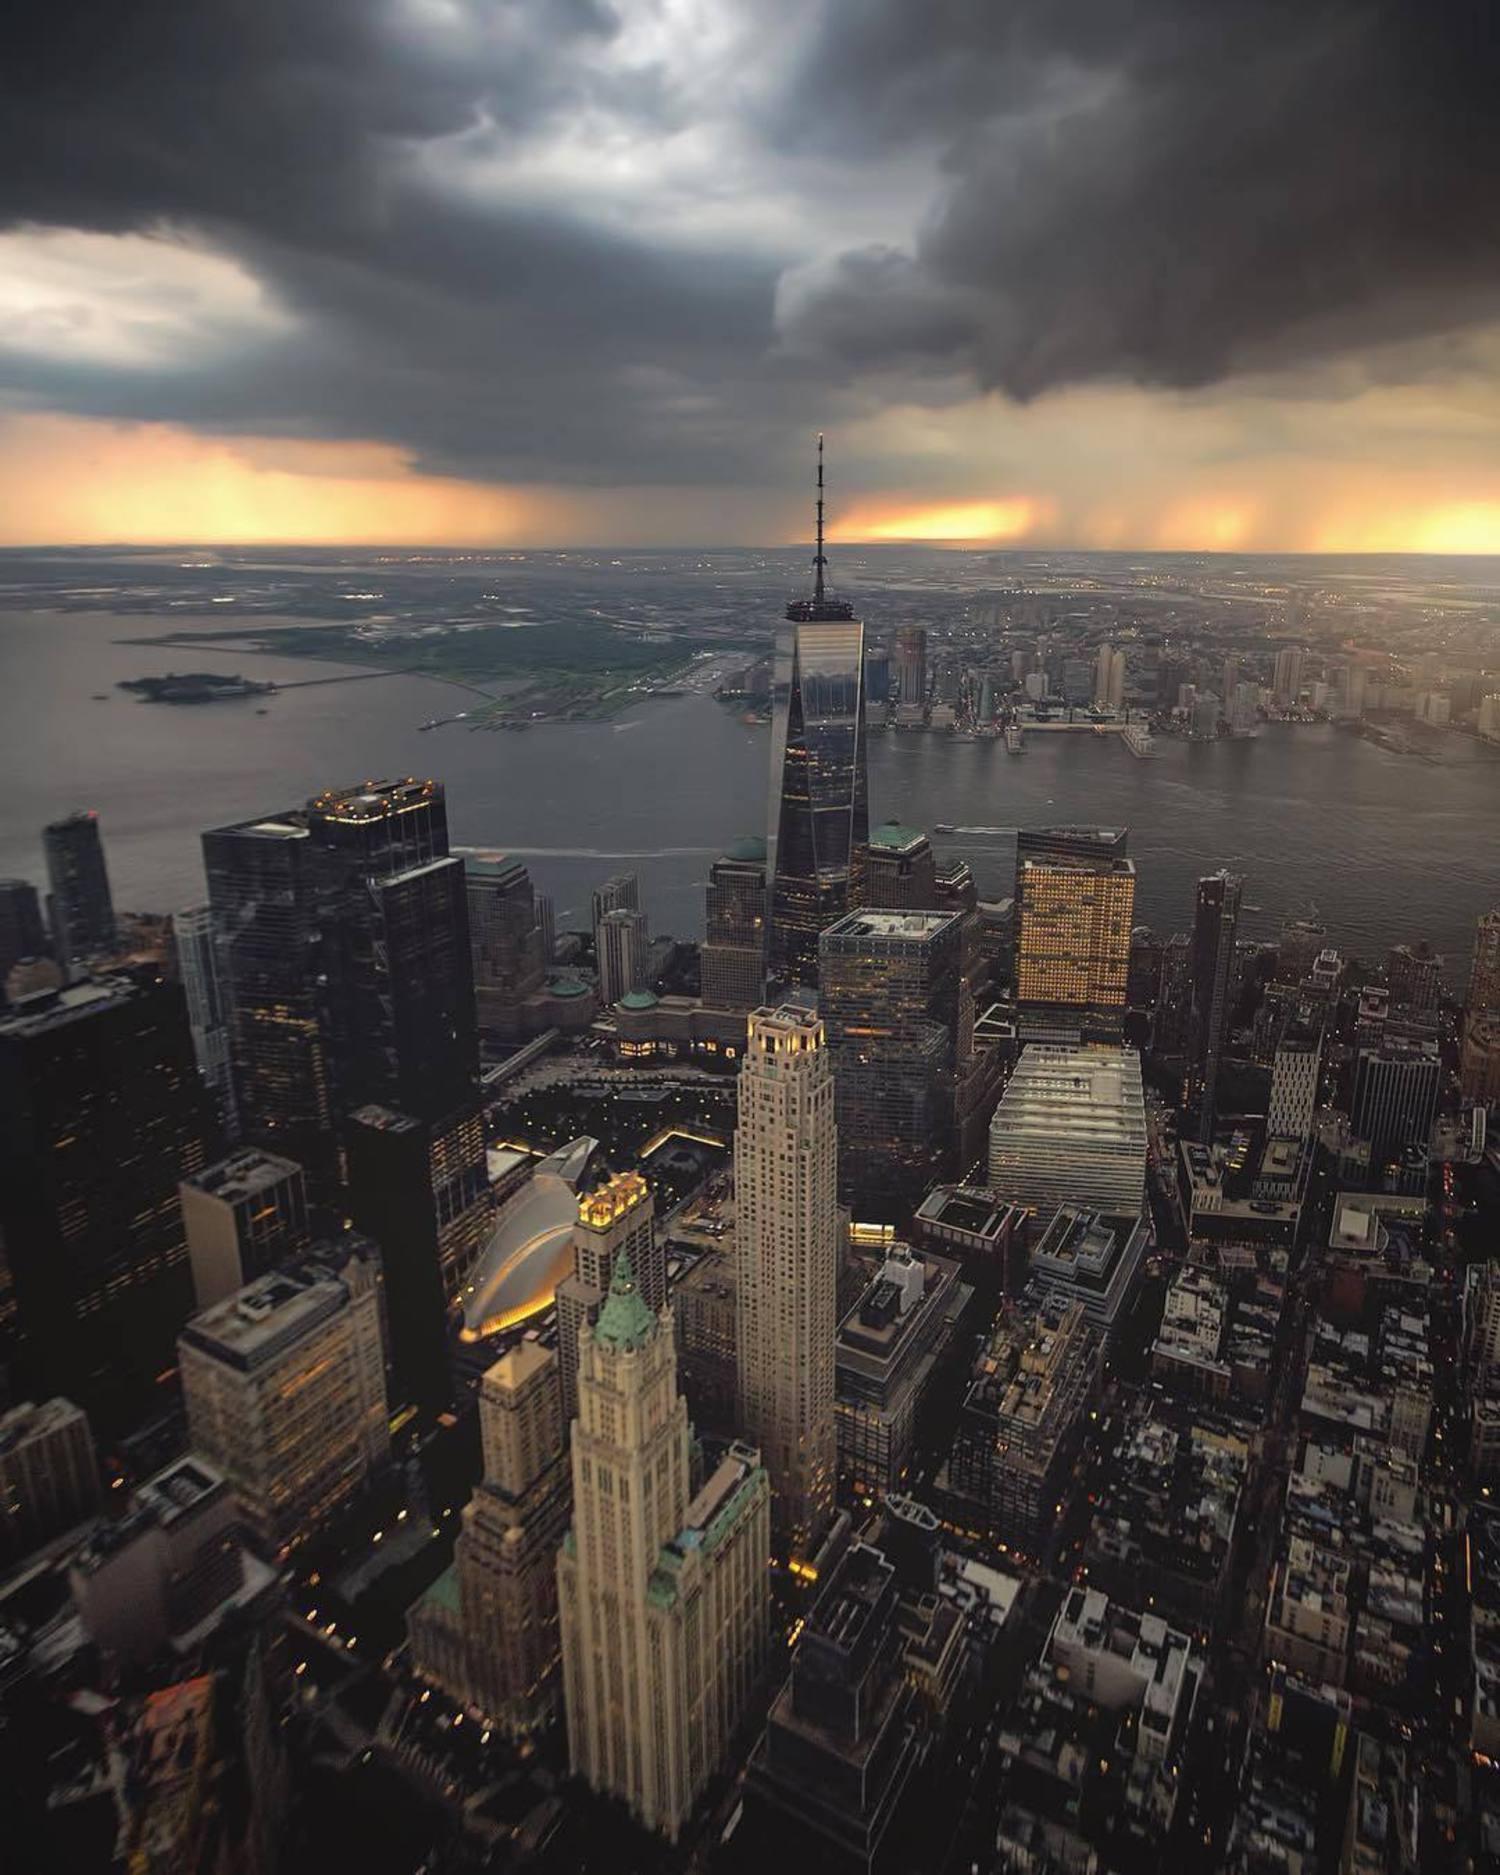 New York, New York. Photo via @beholdingeye #viewingnyc #newyork #newyorkcity #nyc